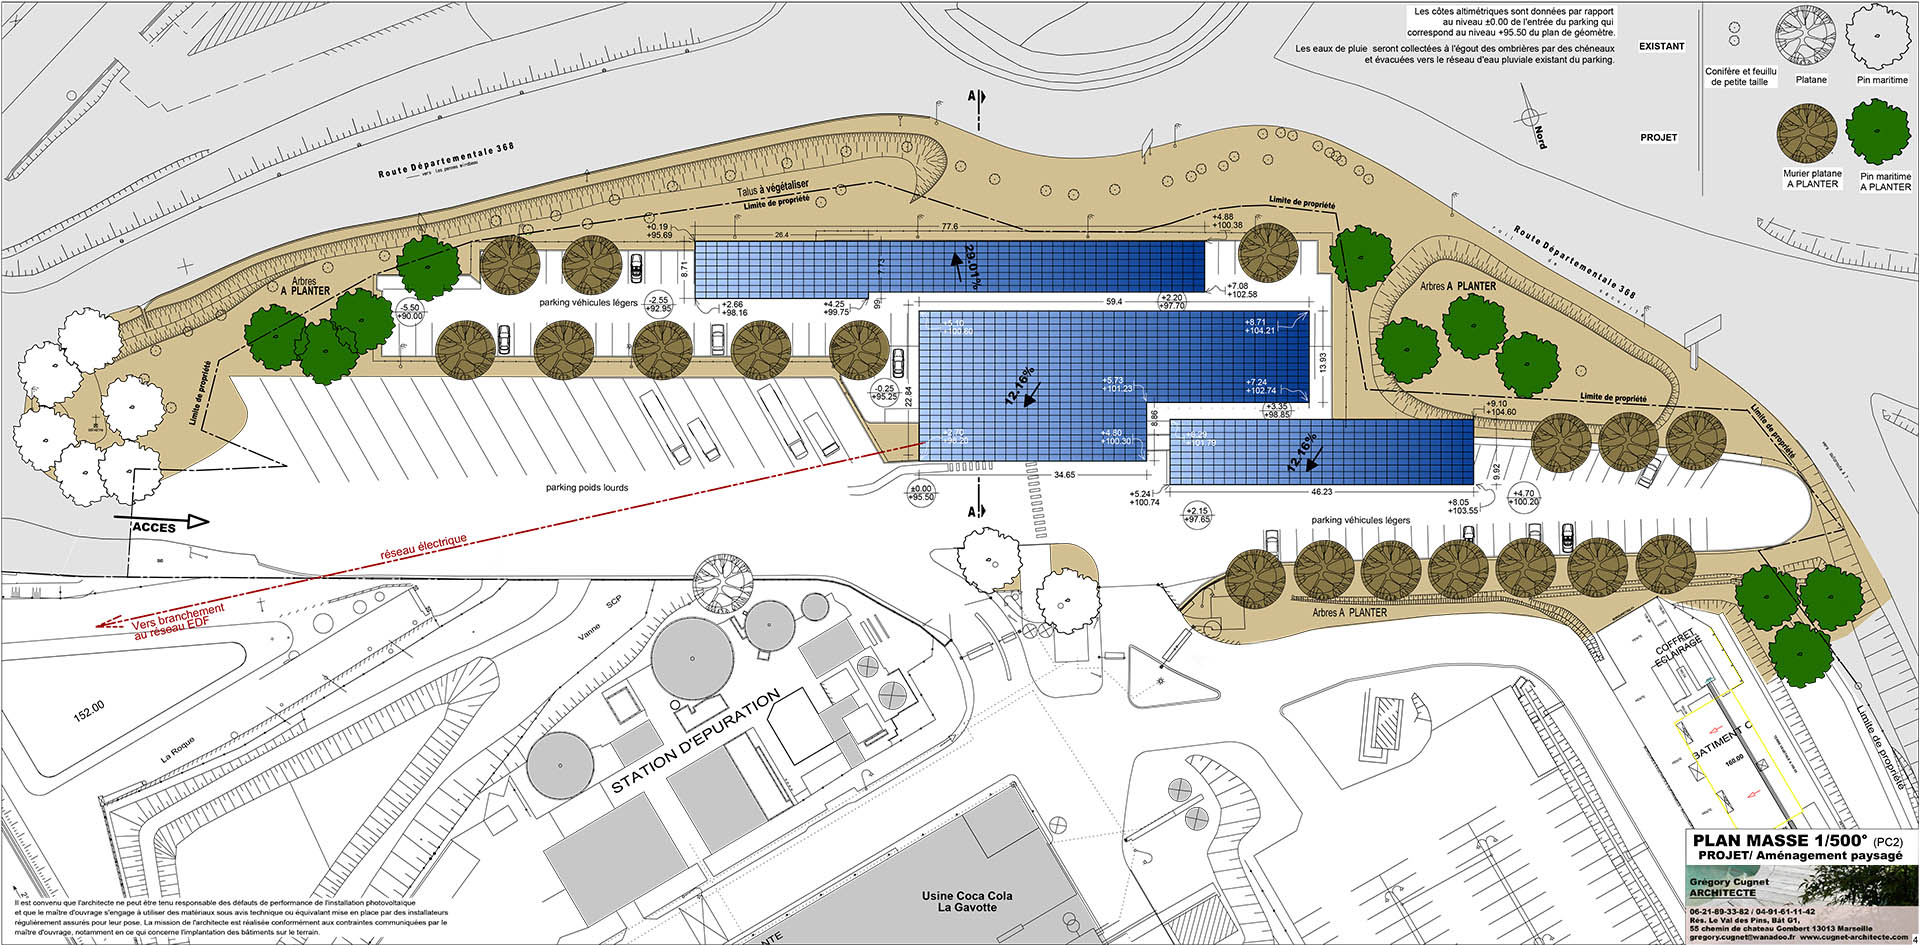 Plan Usine Maison Moderne Of Architecture Usine - Urosrp.com